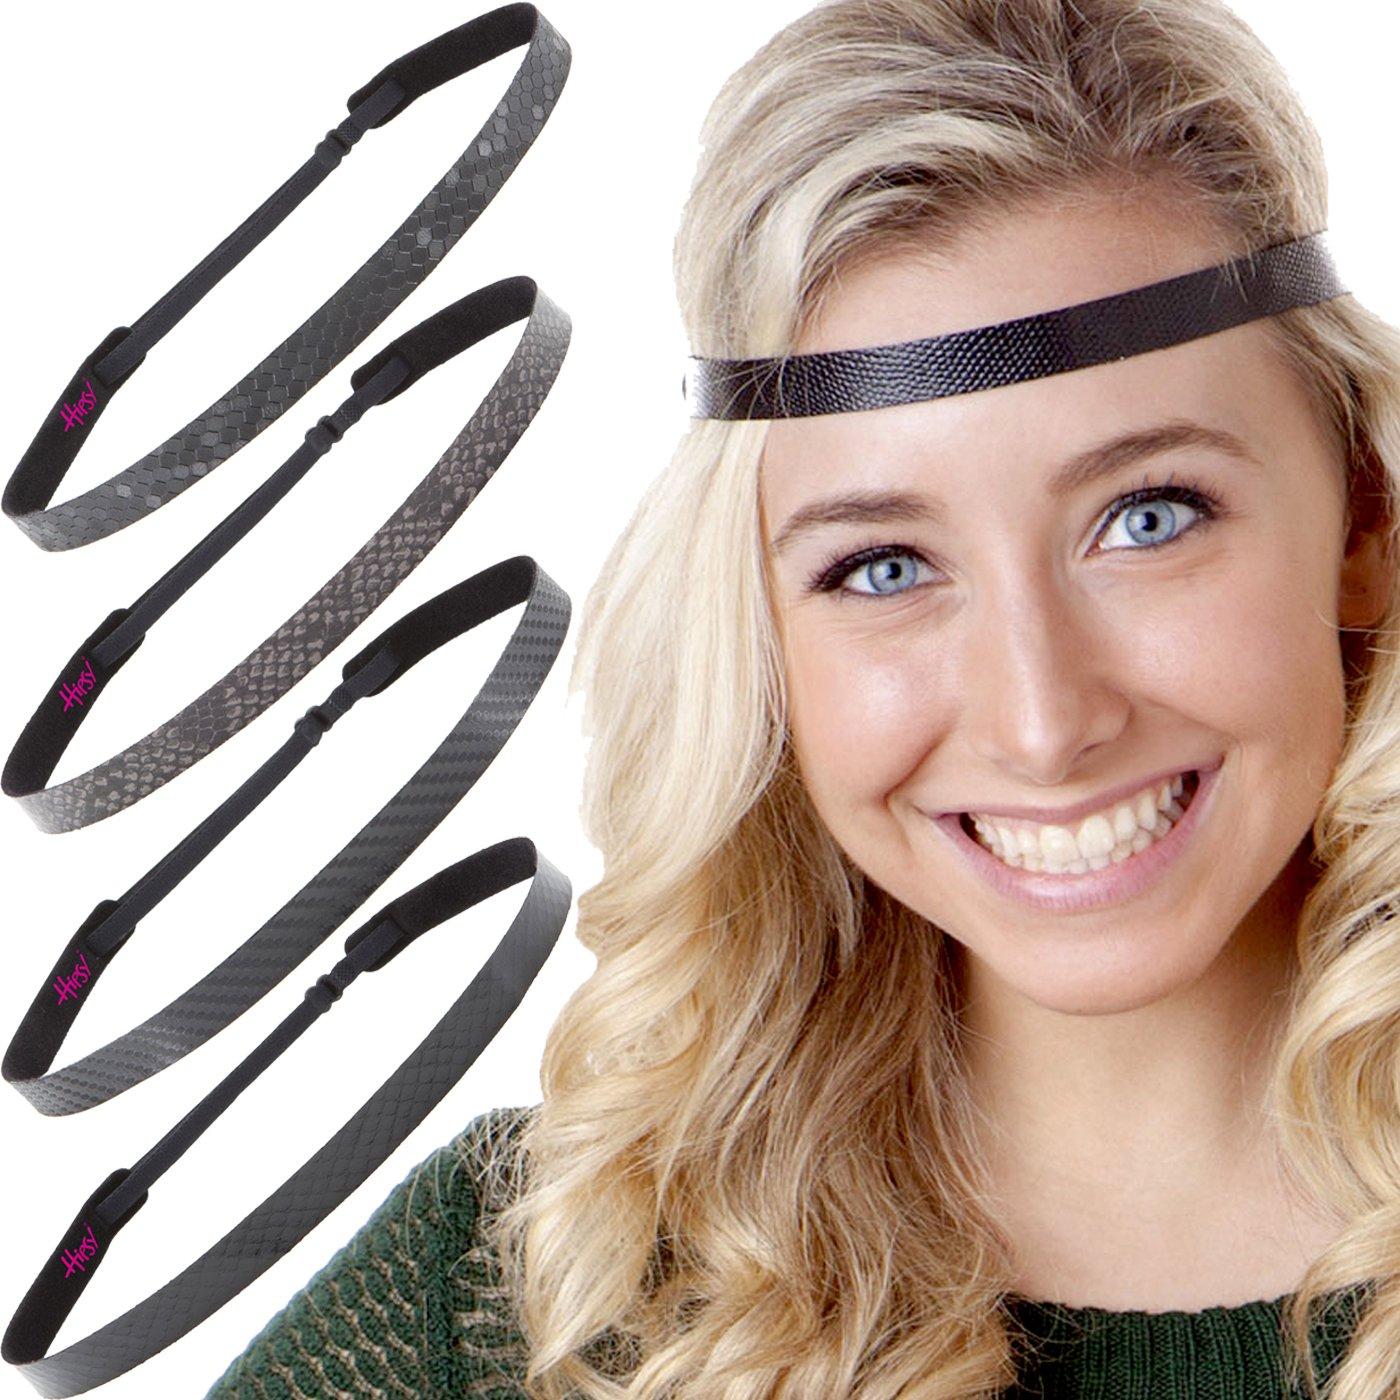 Hipsy Women's Adjustable Cute Fashion Headbands Hairband Gift Pack (Black Headband 5pk)